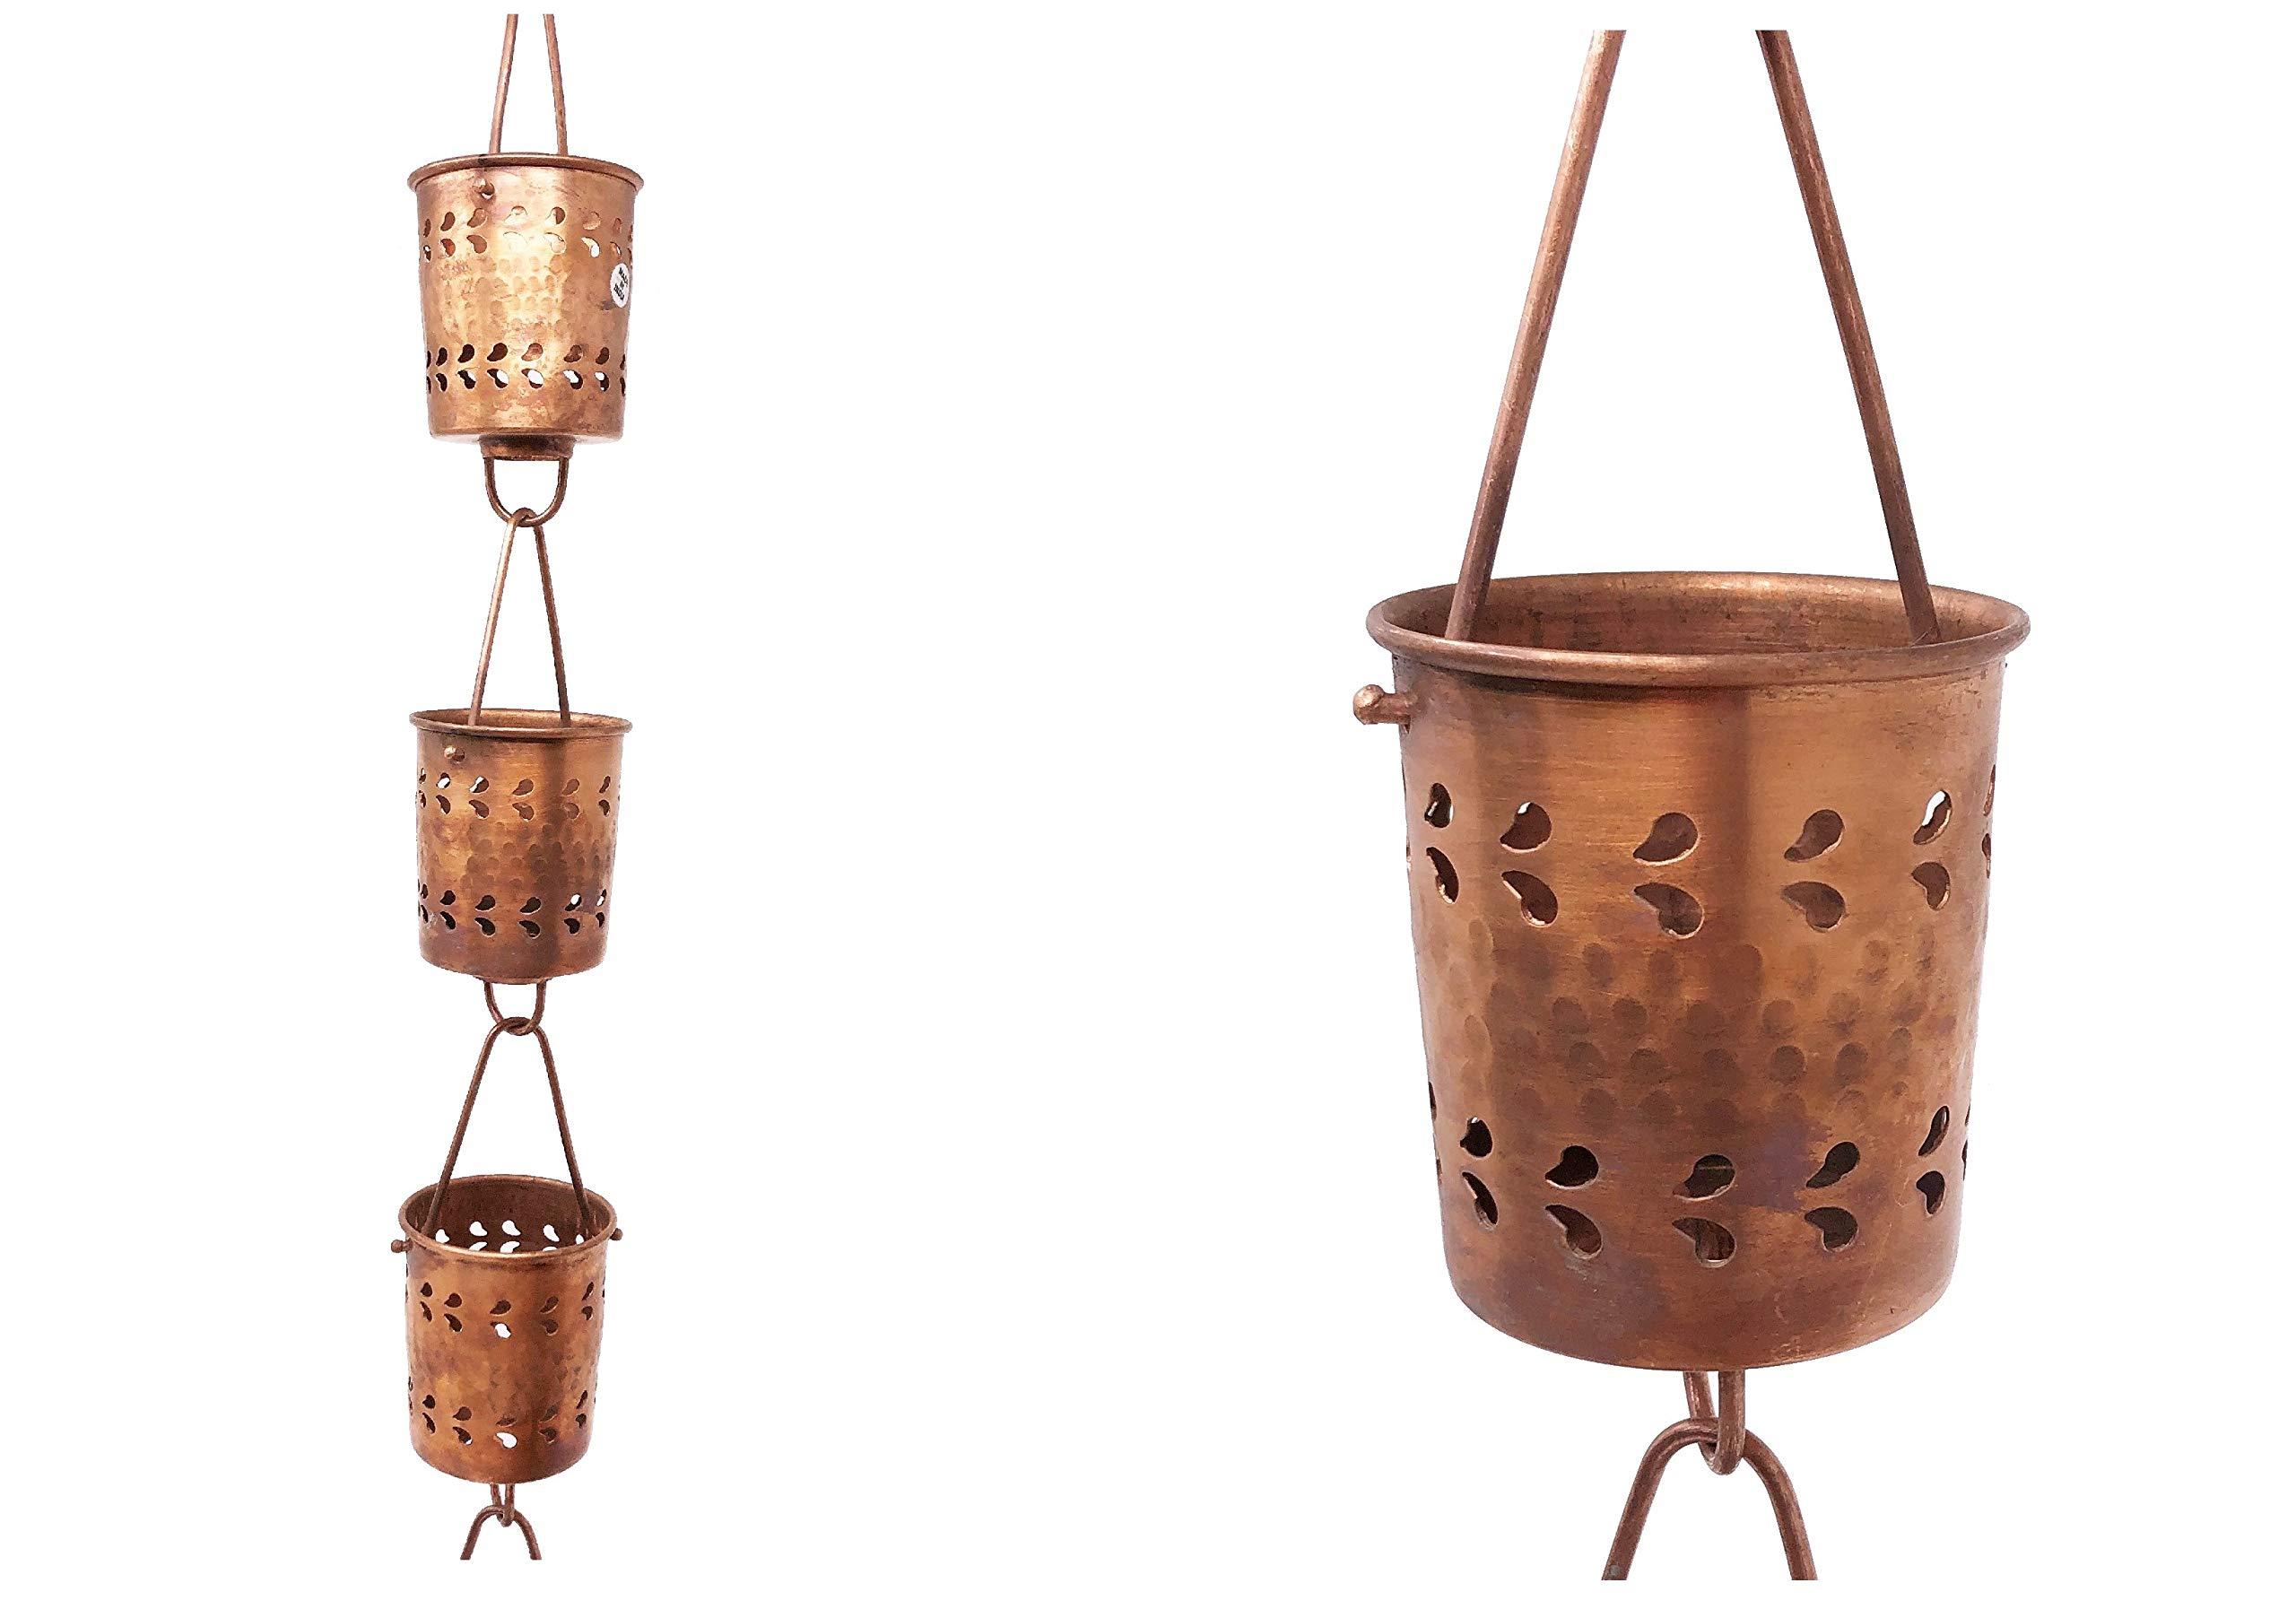 U-nitt 8-1/2 feet Pure Copper Rain Chain for Gutter: Cylinder Florence Cup 8.5 ft Length #5559